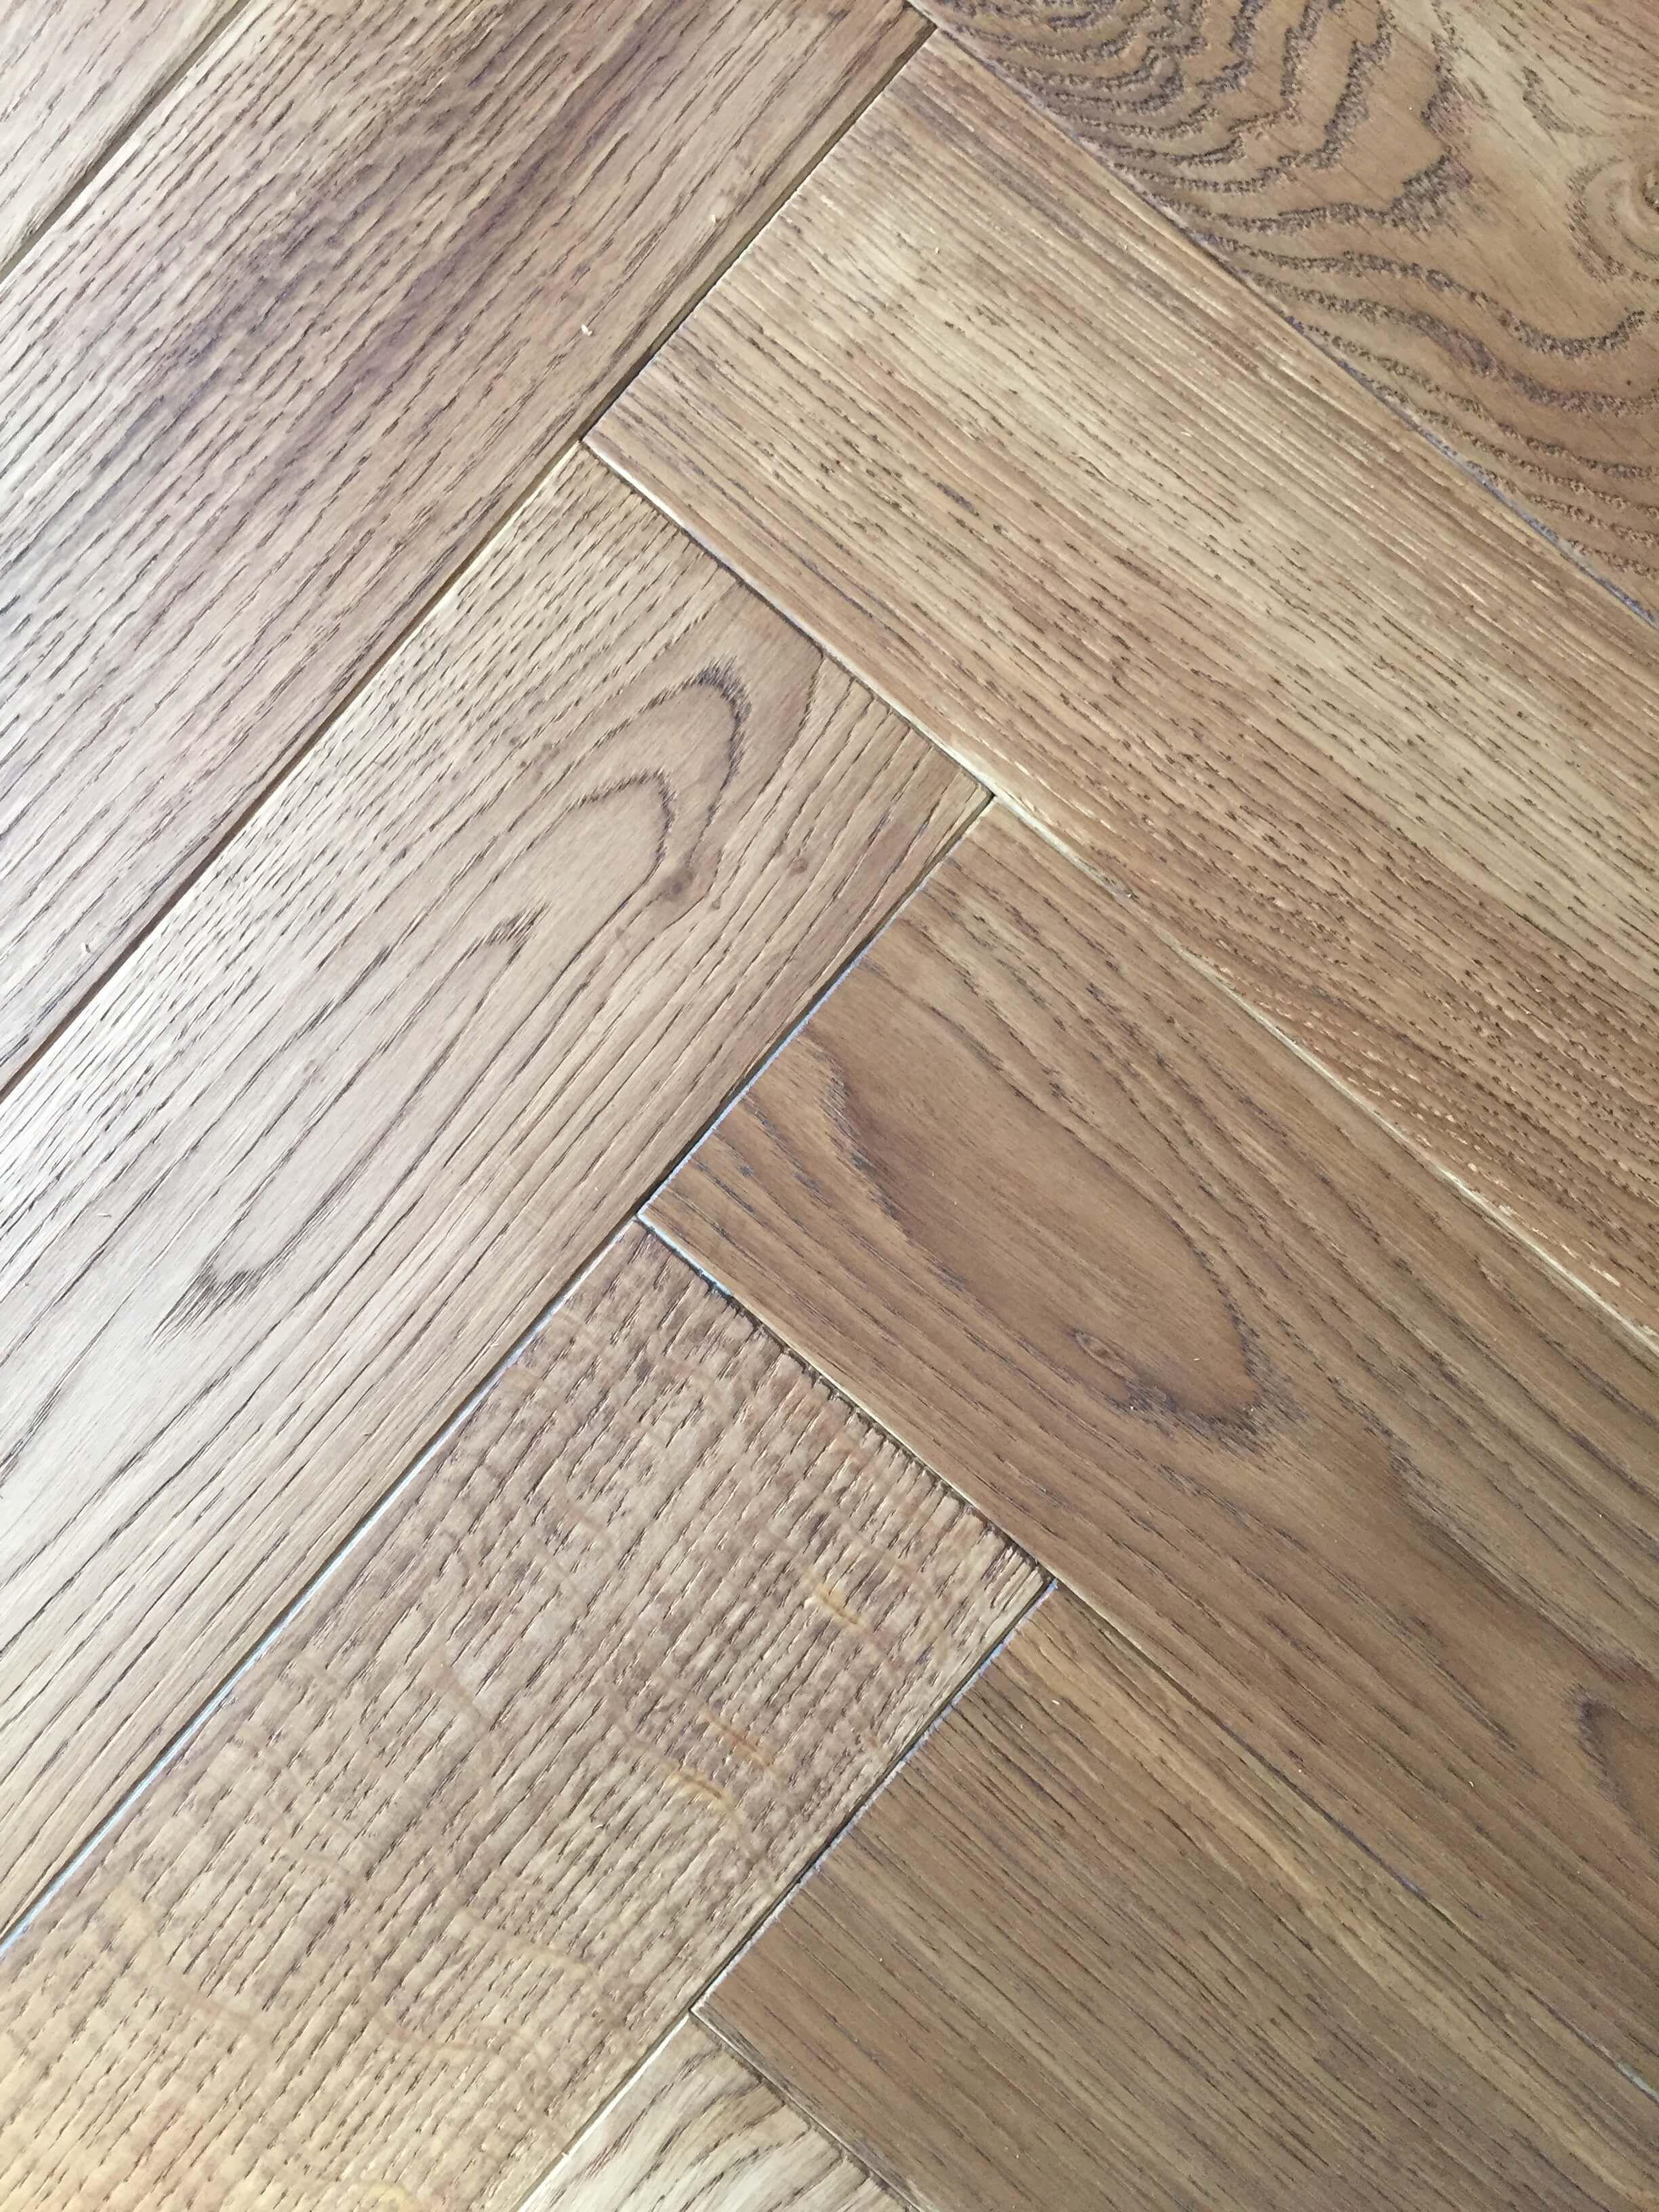 preparing hardwood floors for refinishing of hardwood plank flooring floor plan ideas throughout hardwood plank flooring new decorating an open floor plan living room awesome design plan 0d